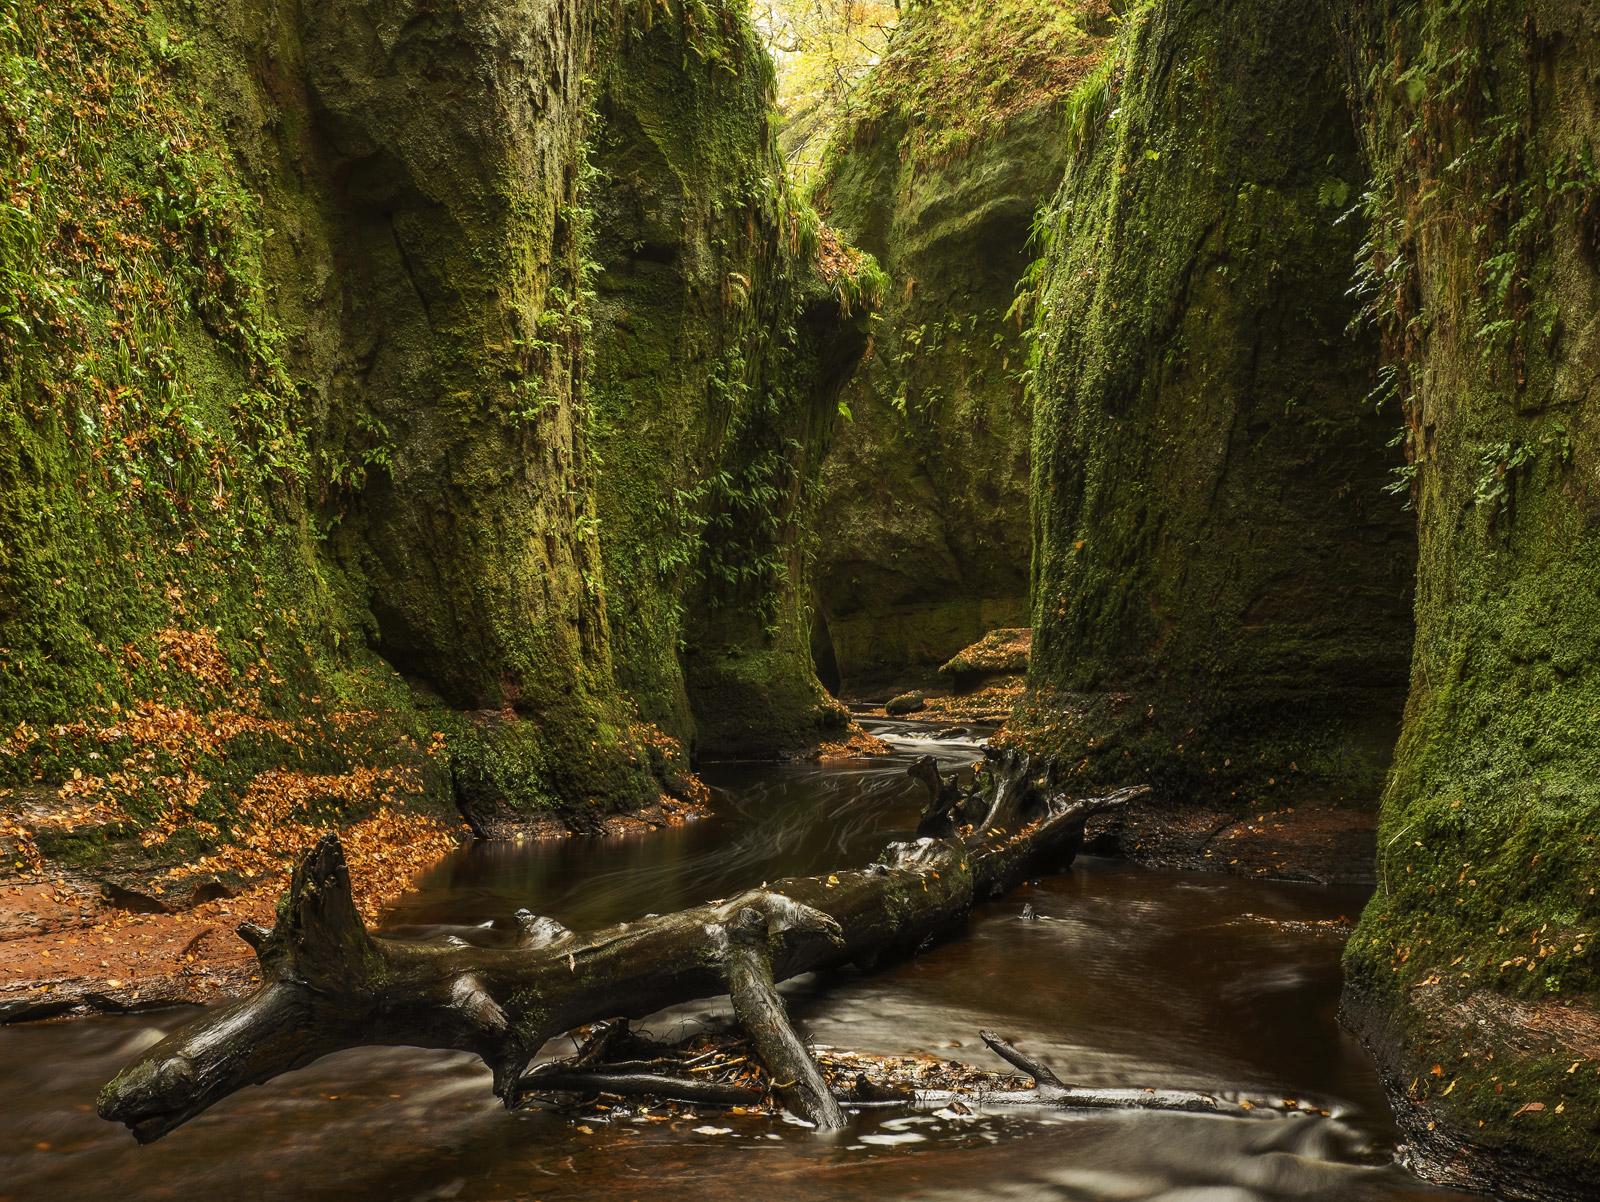 Primordial Soup, Finnichs Glen, Trossachs, Scotland, slime, belly, imagination, bloody, artery, river, peat, green, drap, photo